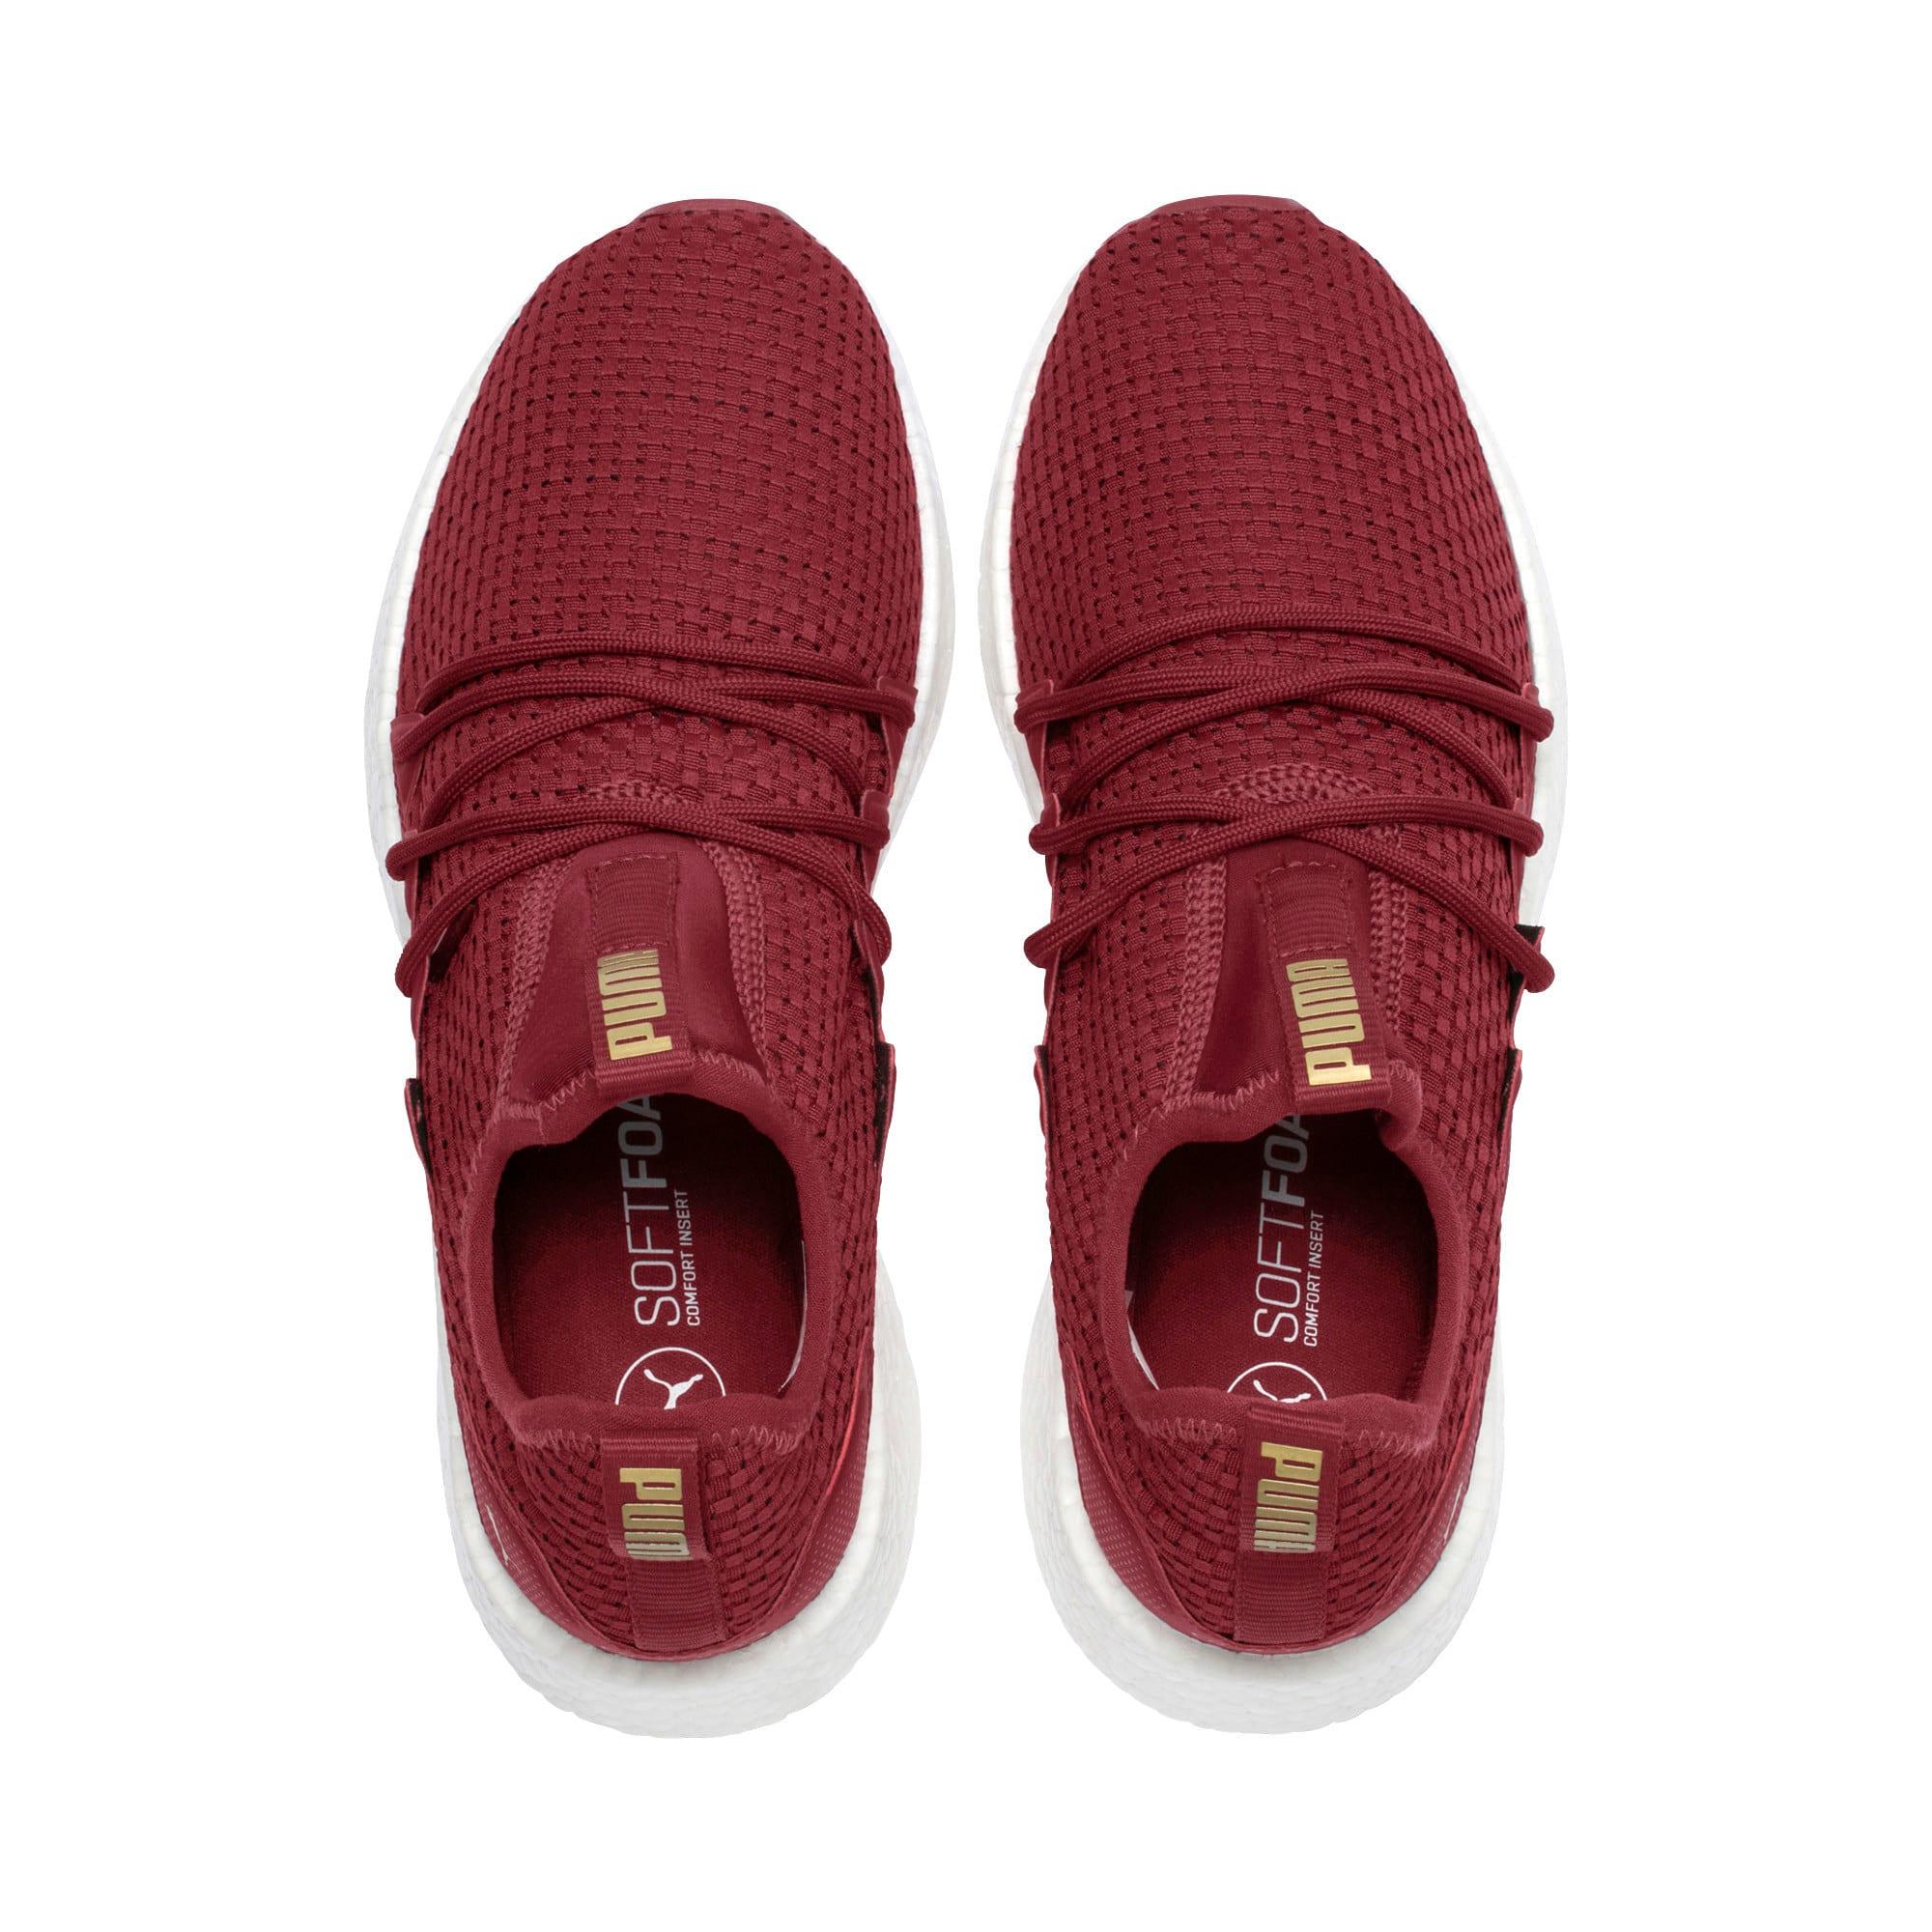 Thumbnail 6 of NRGY Neko VT Women's Running Shoes, Pomegranate-Metallic Gold, medium